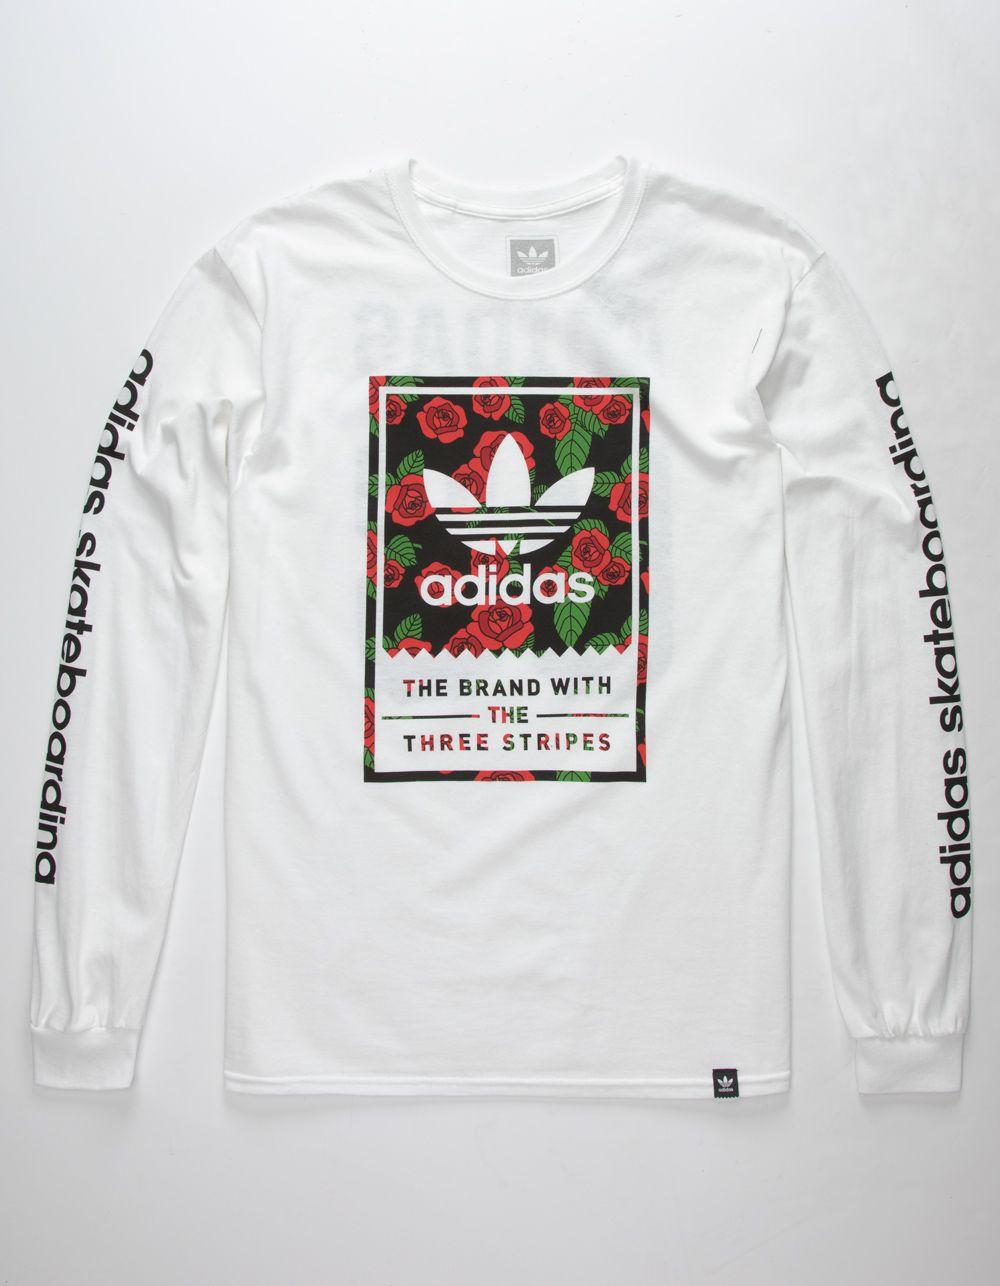 Adidas Classic Print Rose Mens T Shirt White 329395150 Mens Tshirts Adidas Shirt Mens Addidas Shirts [ 1286 x 1000 Pixel ]